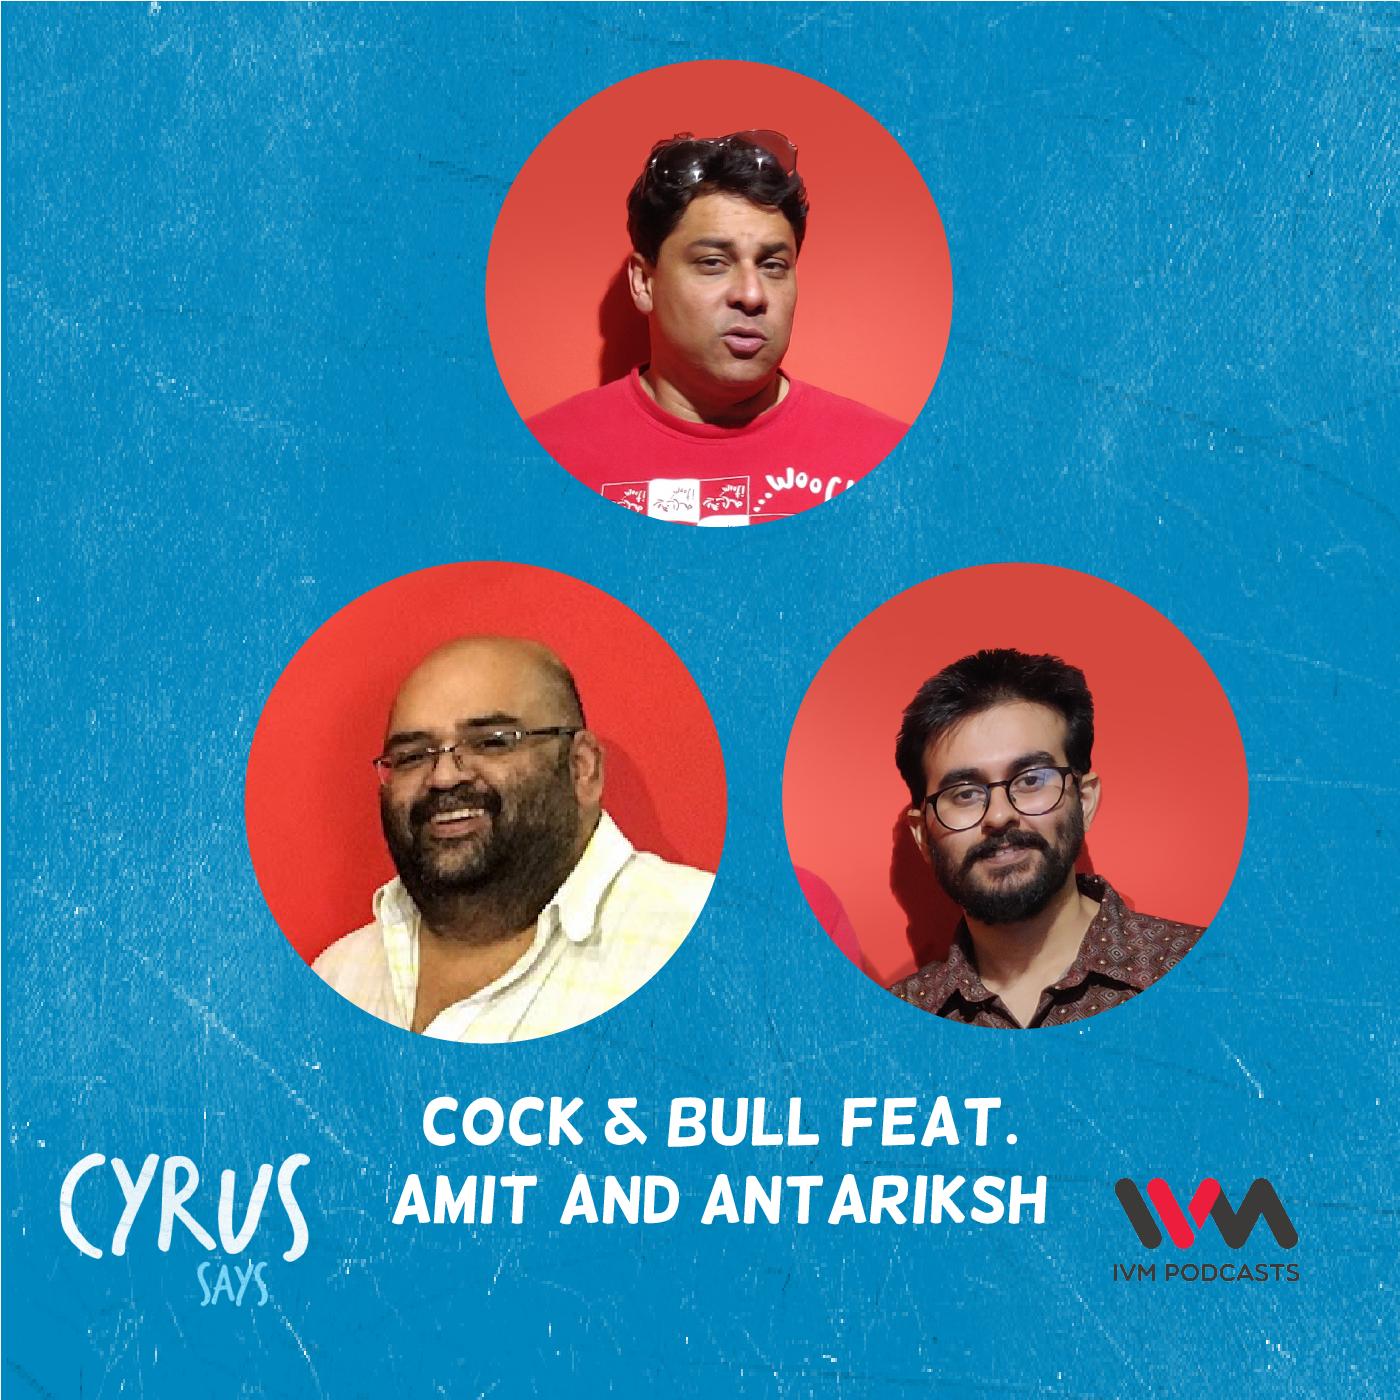 Ep. 629: Cock & Bull feat. Amit and Antariksh